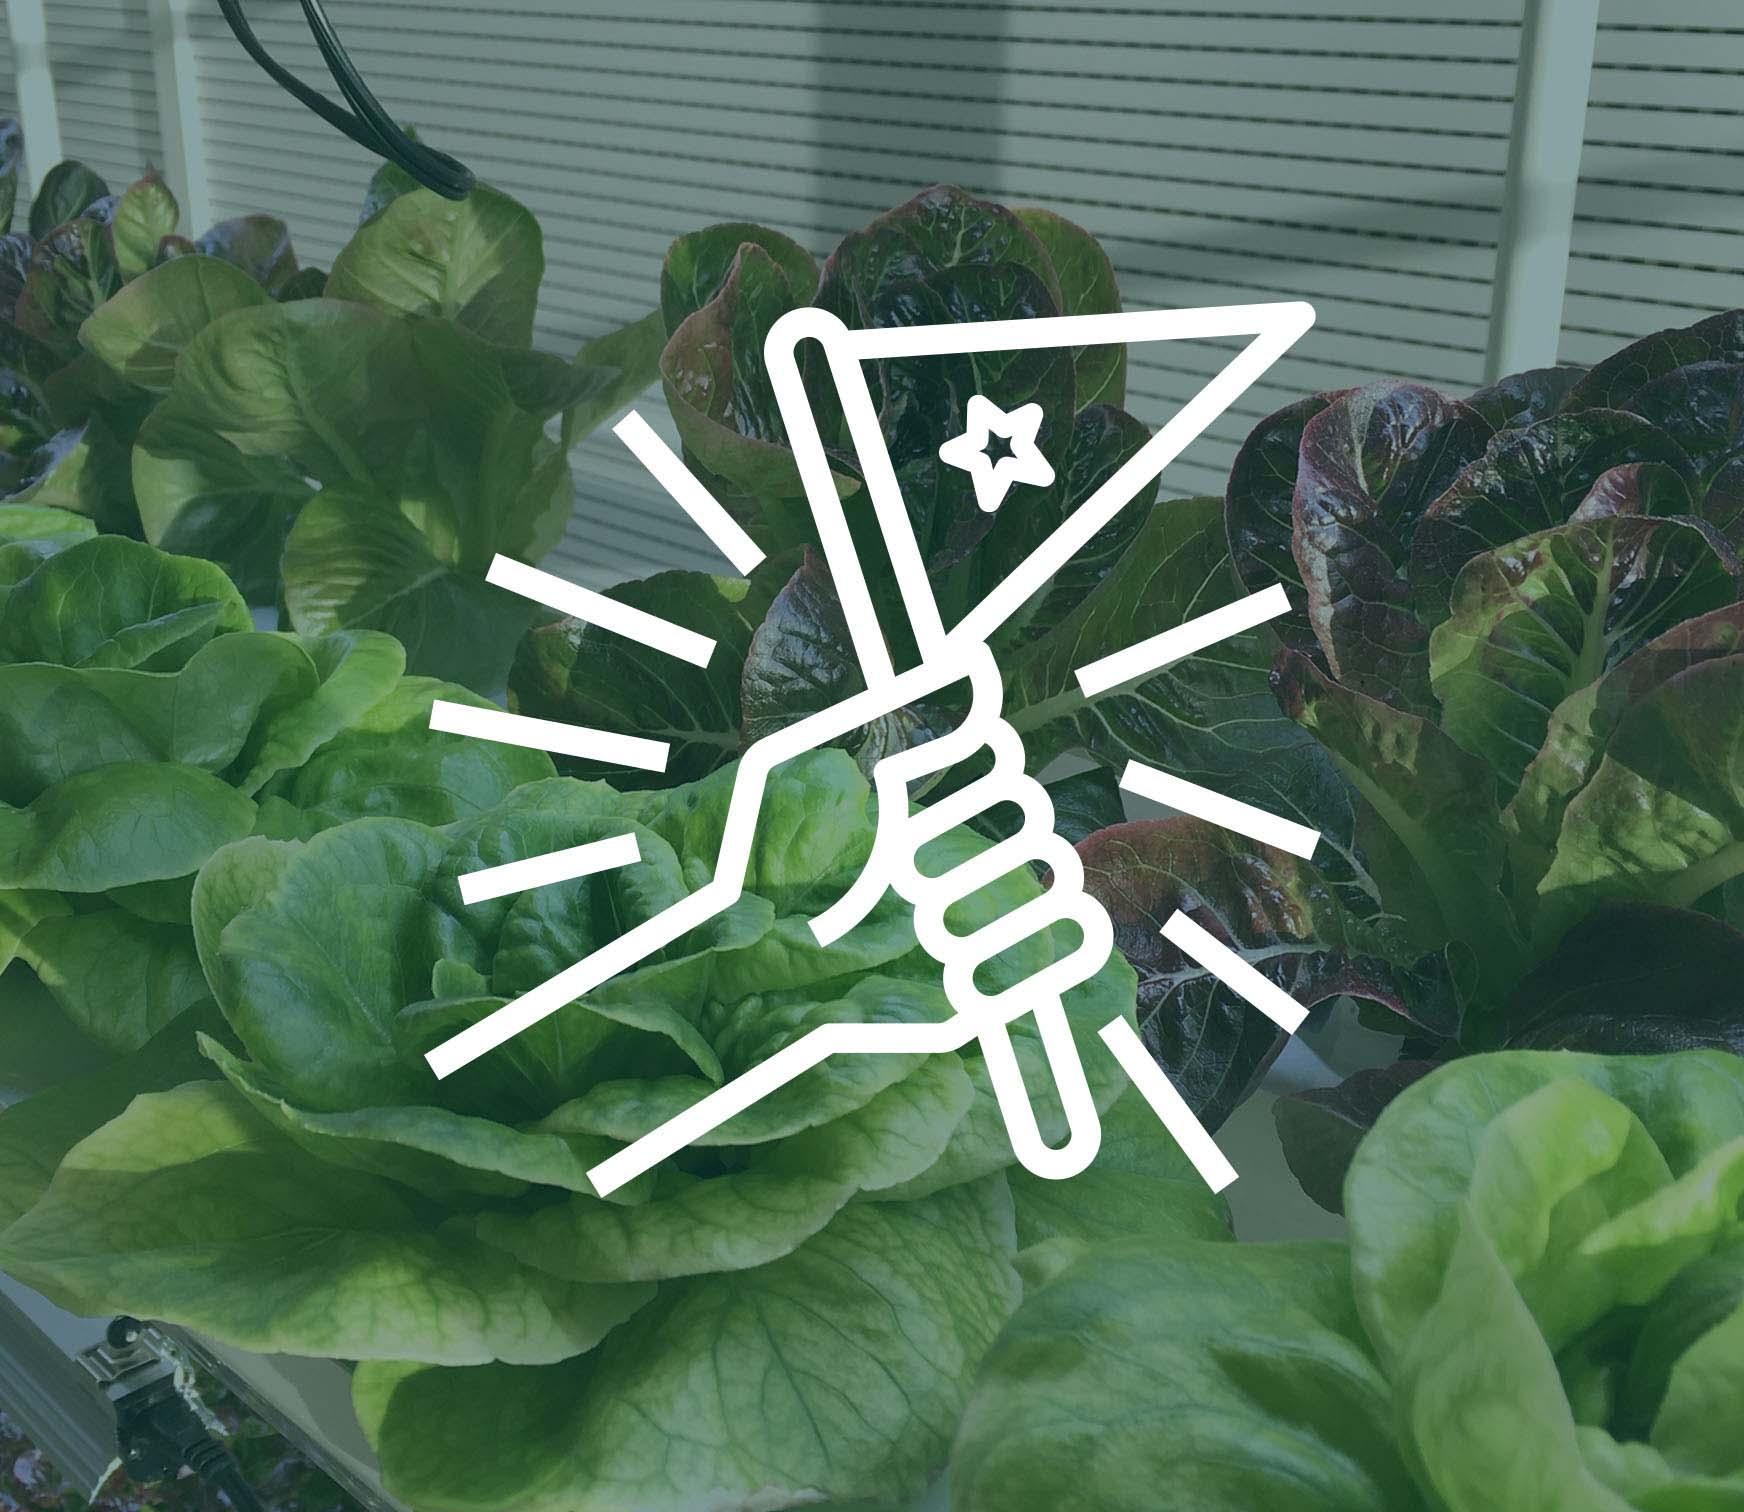 vireo accompagnement renouvellement jardin hydroponique